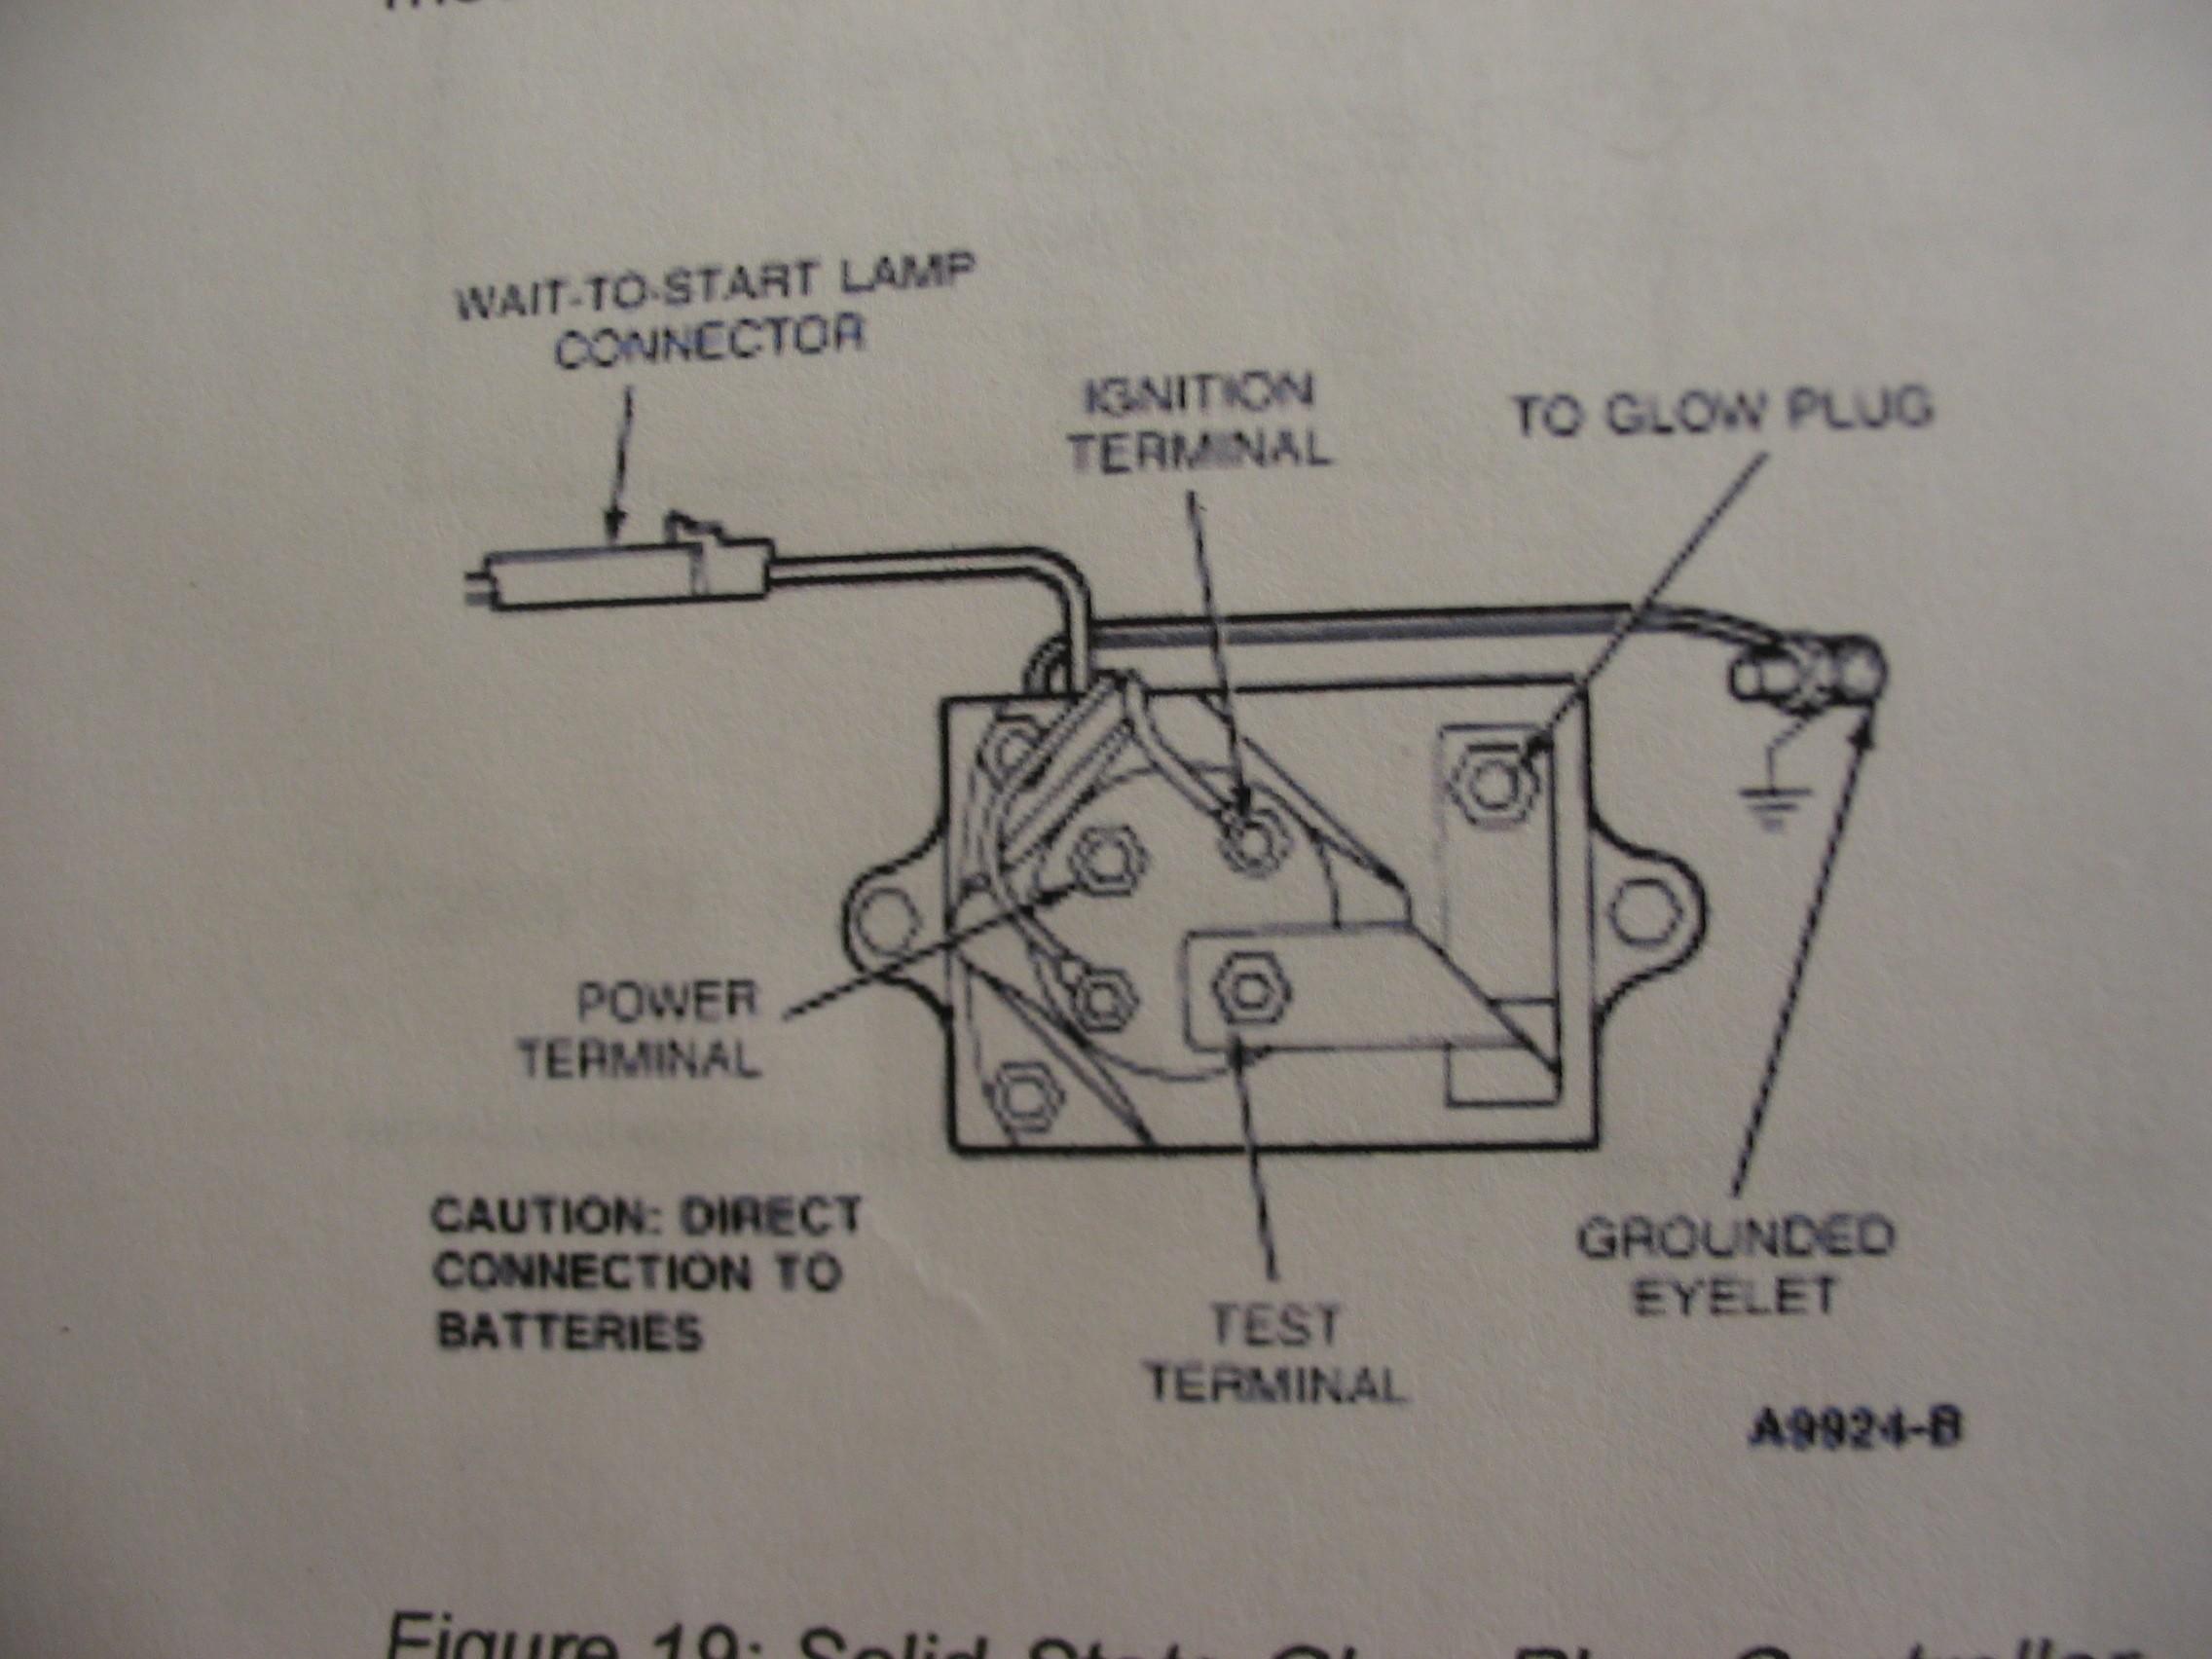 Beru Glow Plug Controller Wiring Diagram Hy 2699] Glow Plug Relay Wiring Schematic Of Beru Glow Plug Controller Wiring Diagram